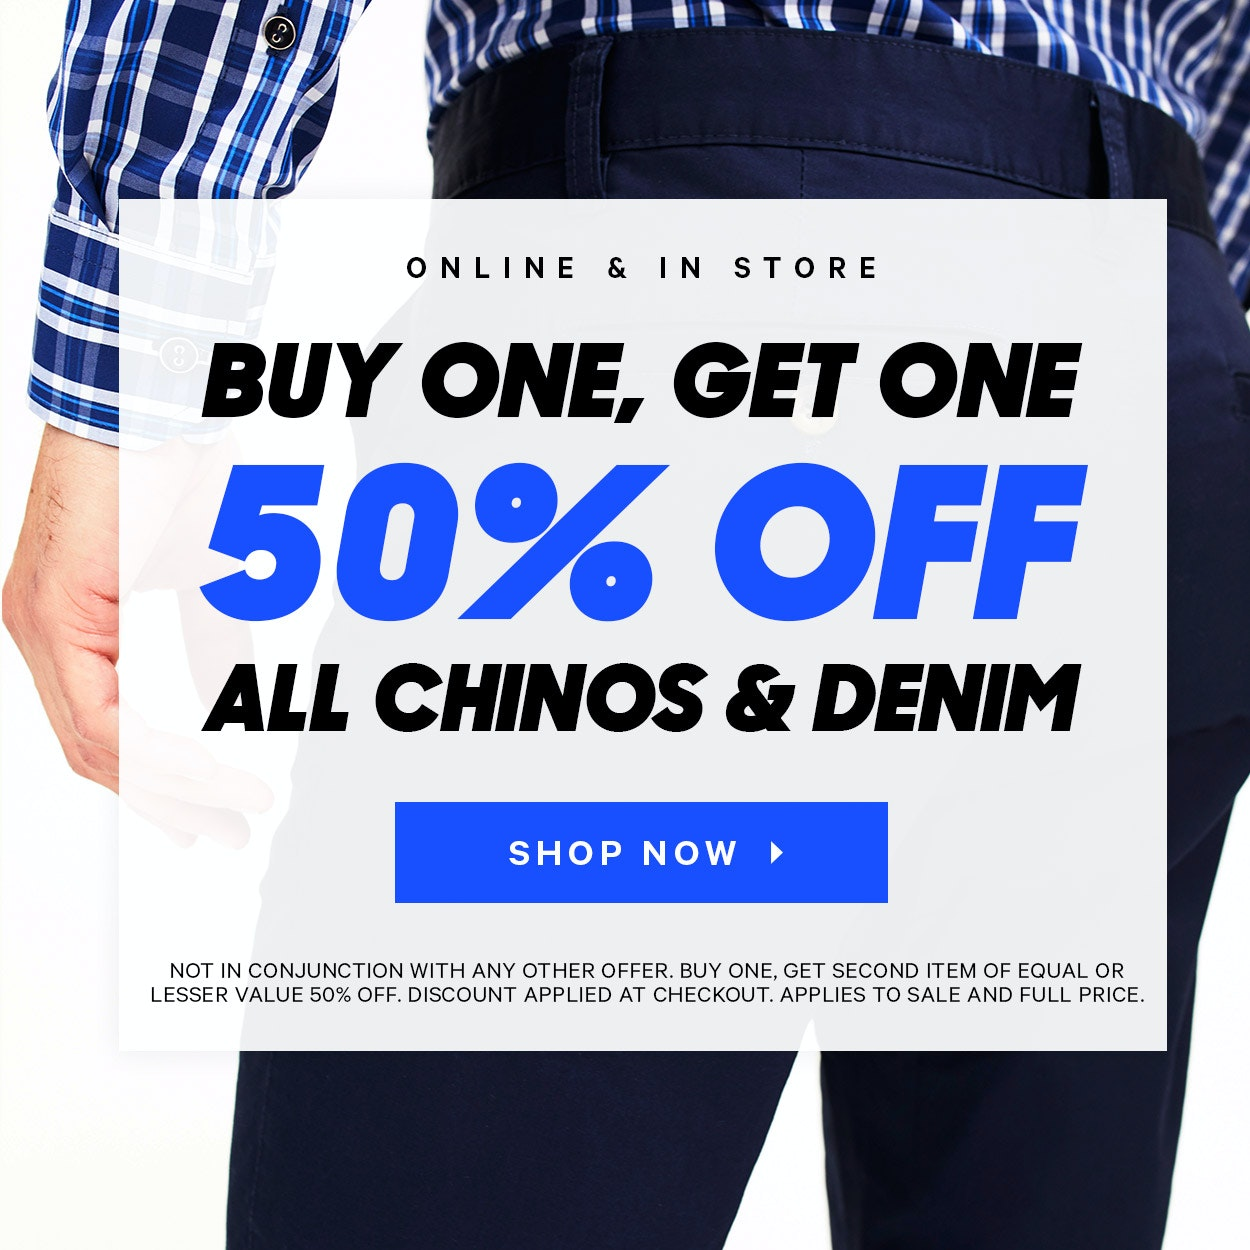 BOGO 50% Off Denim and Chinos